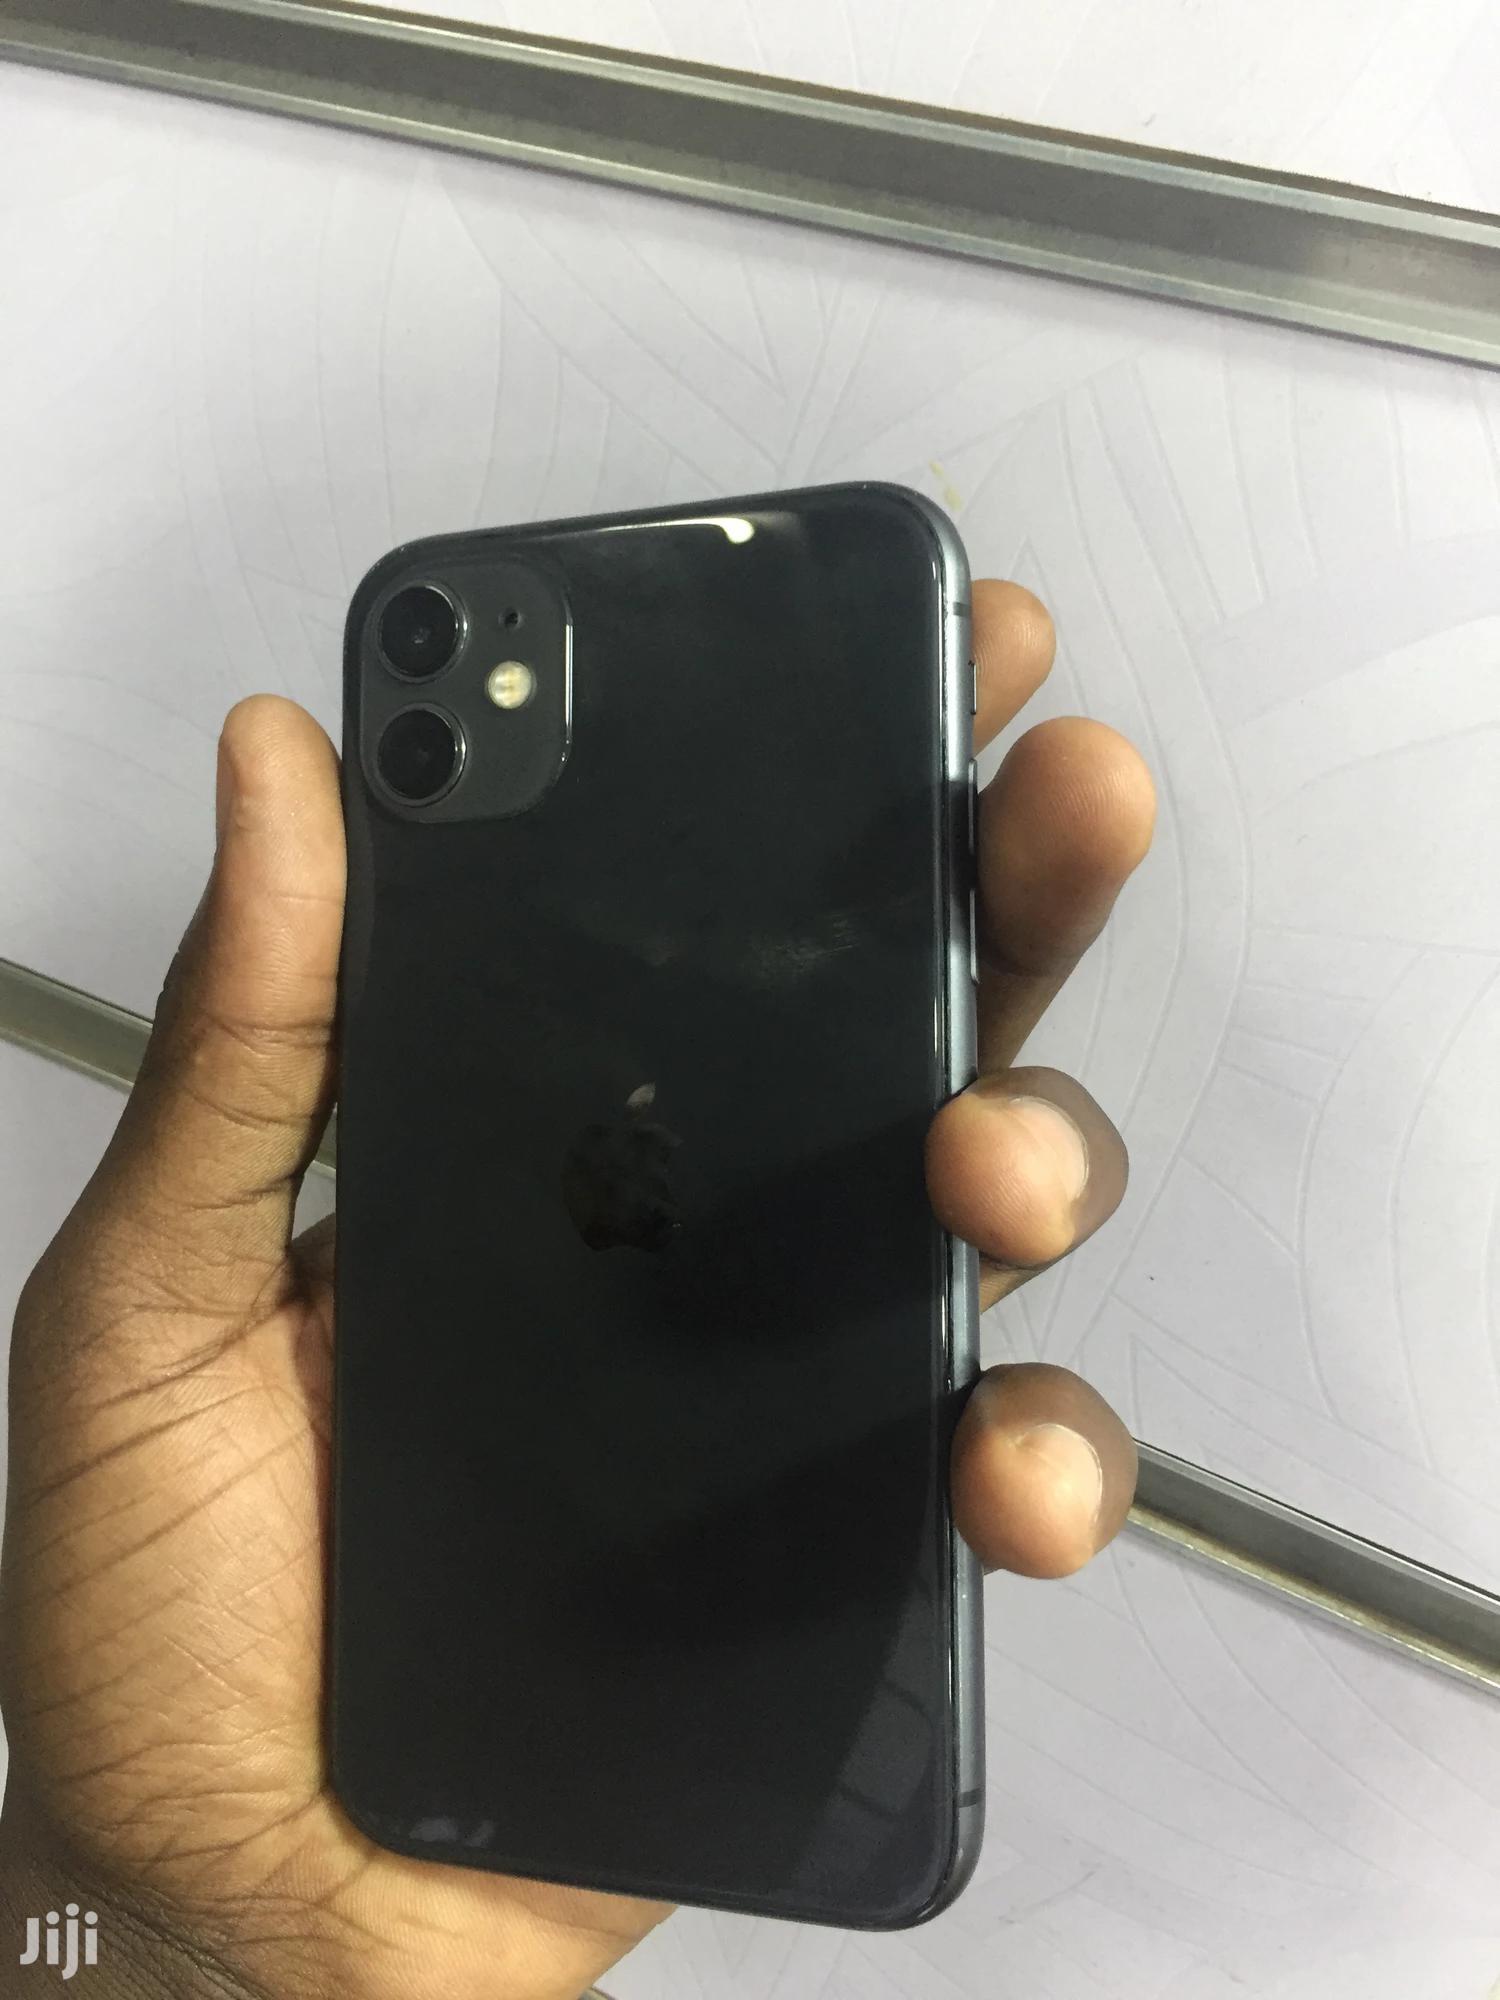 Apple iPhone 11 64 GB Black | Mobile Phones for sale in Kampala, Central Region, Uganda